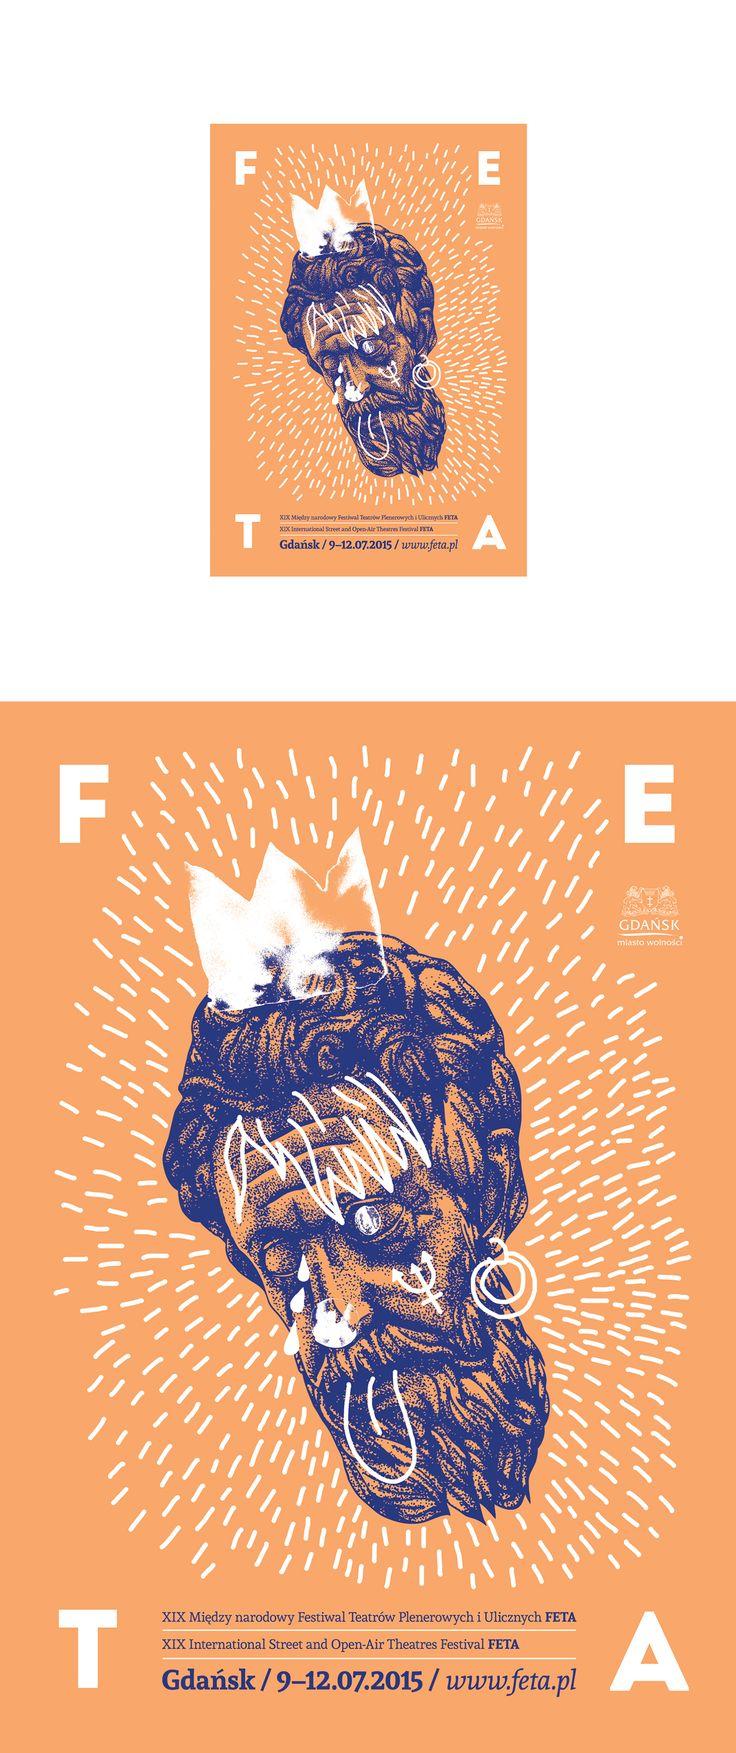 Poster for street theatre festival FETA made for Poster Design classes, 2015